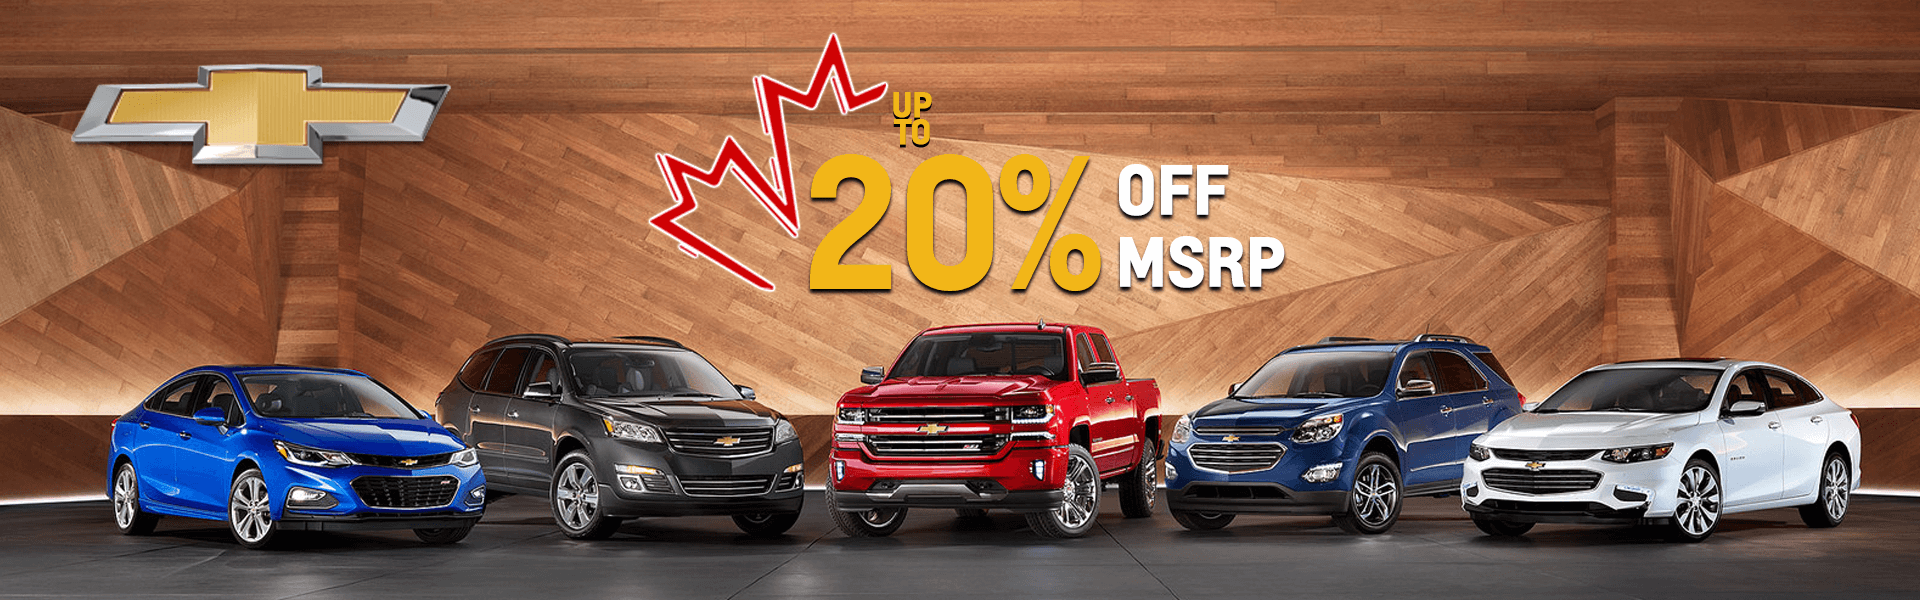 Chevrolet 20% OFF MSRP